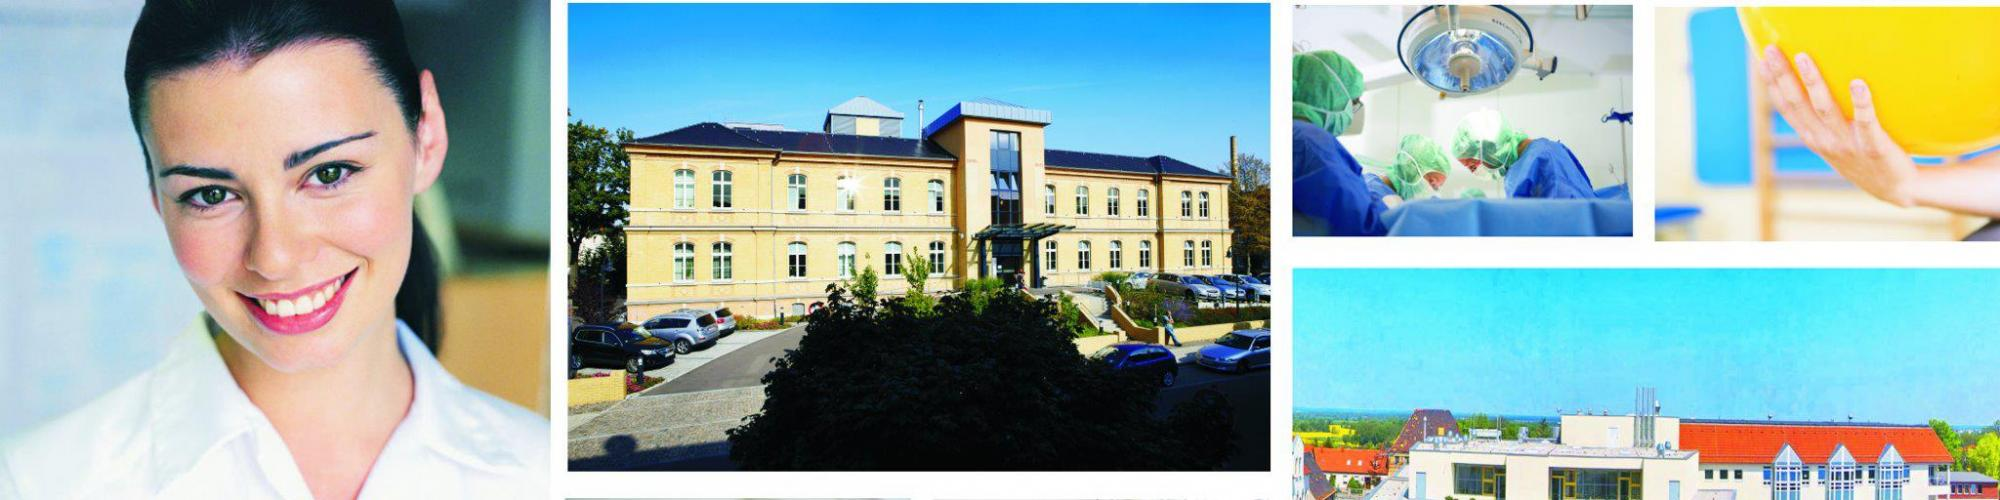 Kreiskrankenhaus Delitzsch GmbH